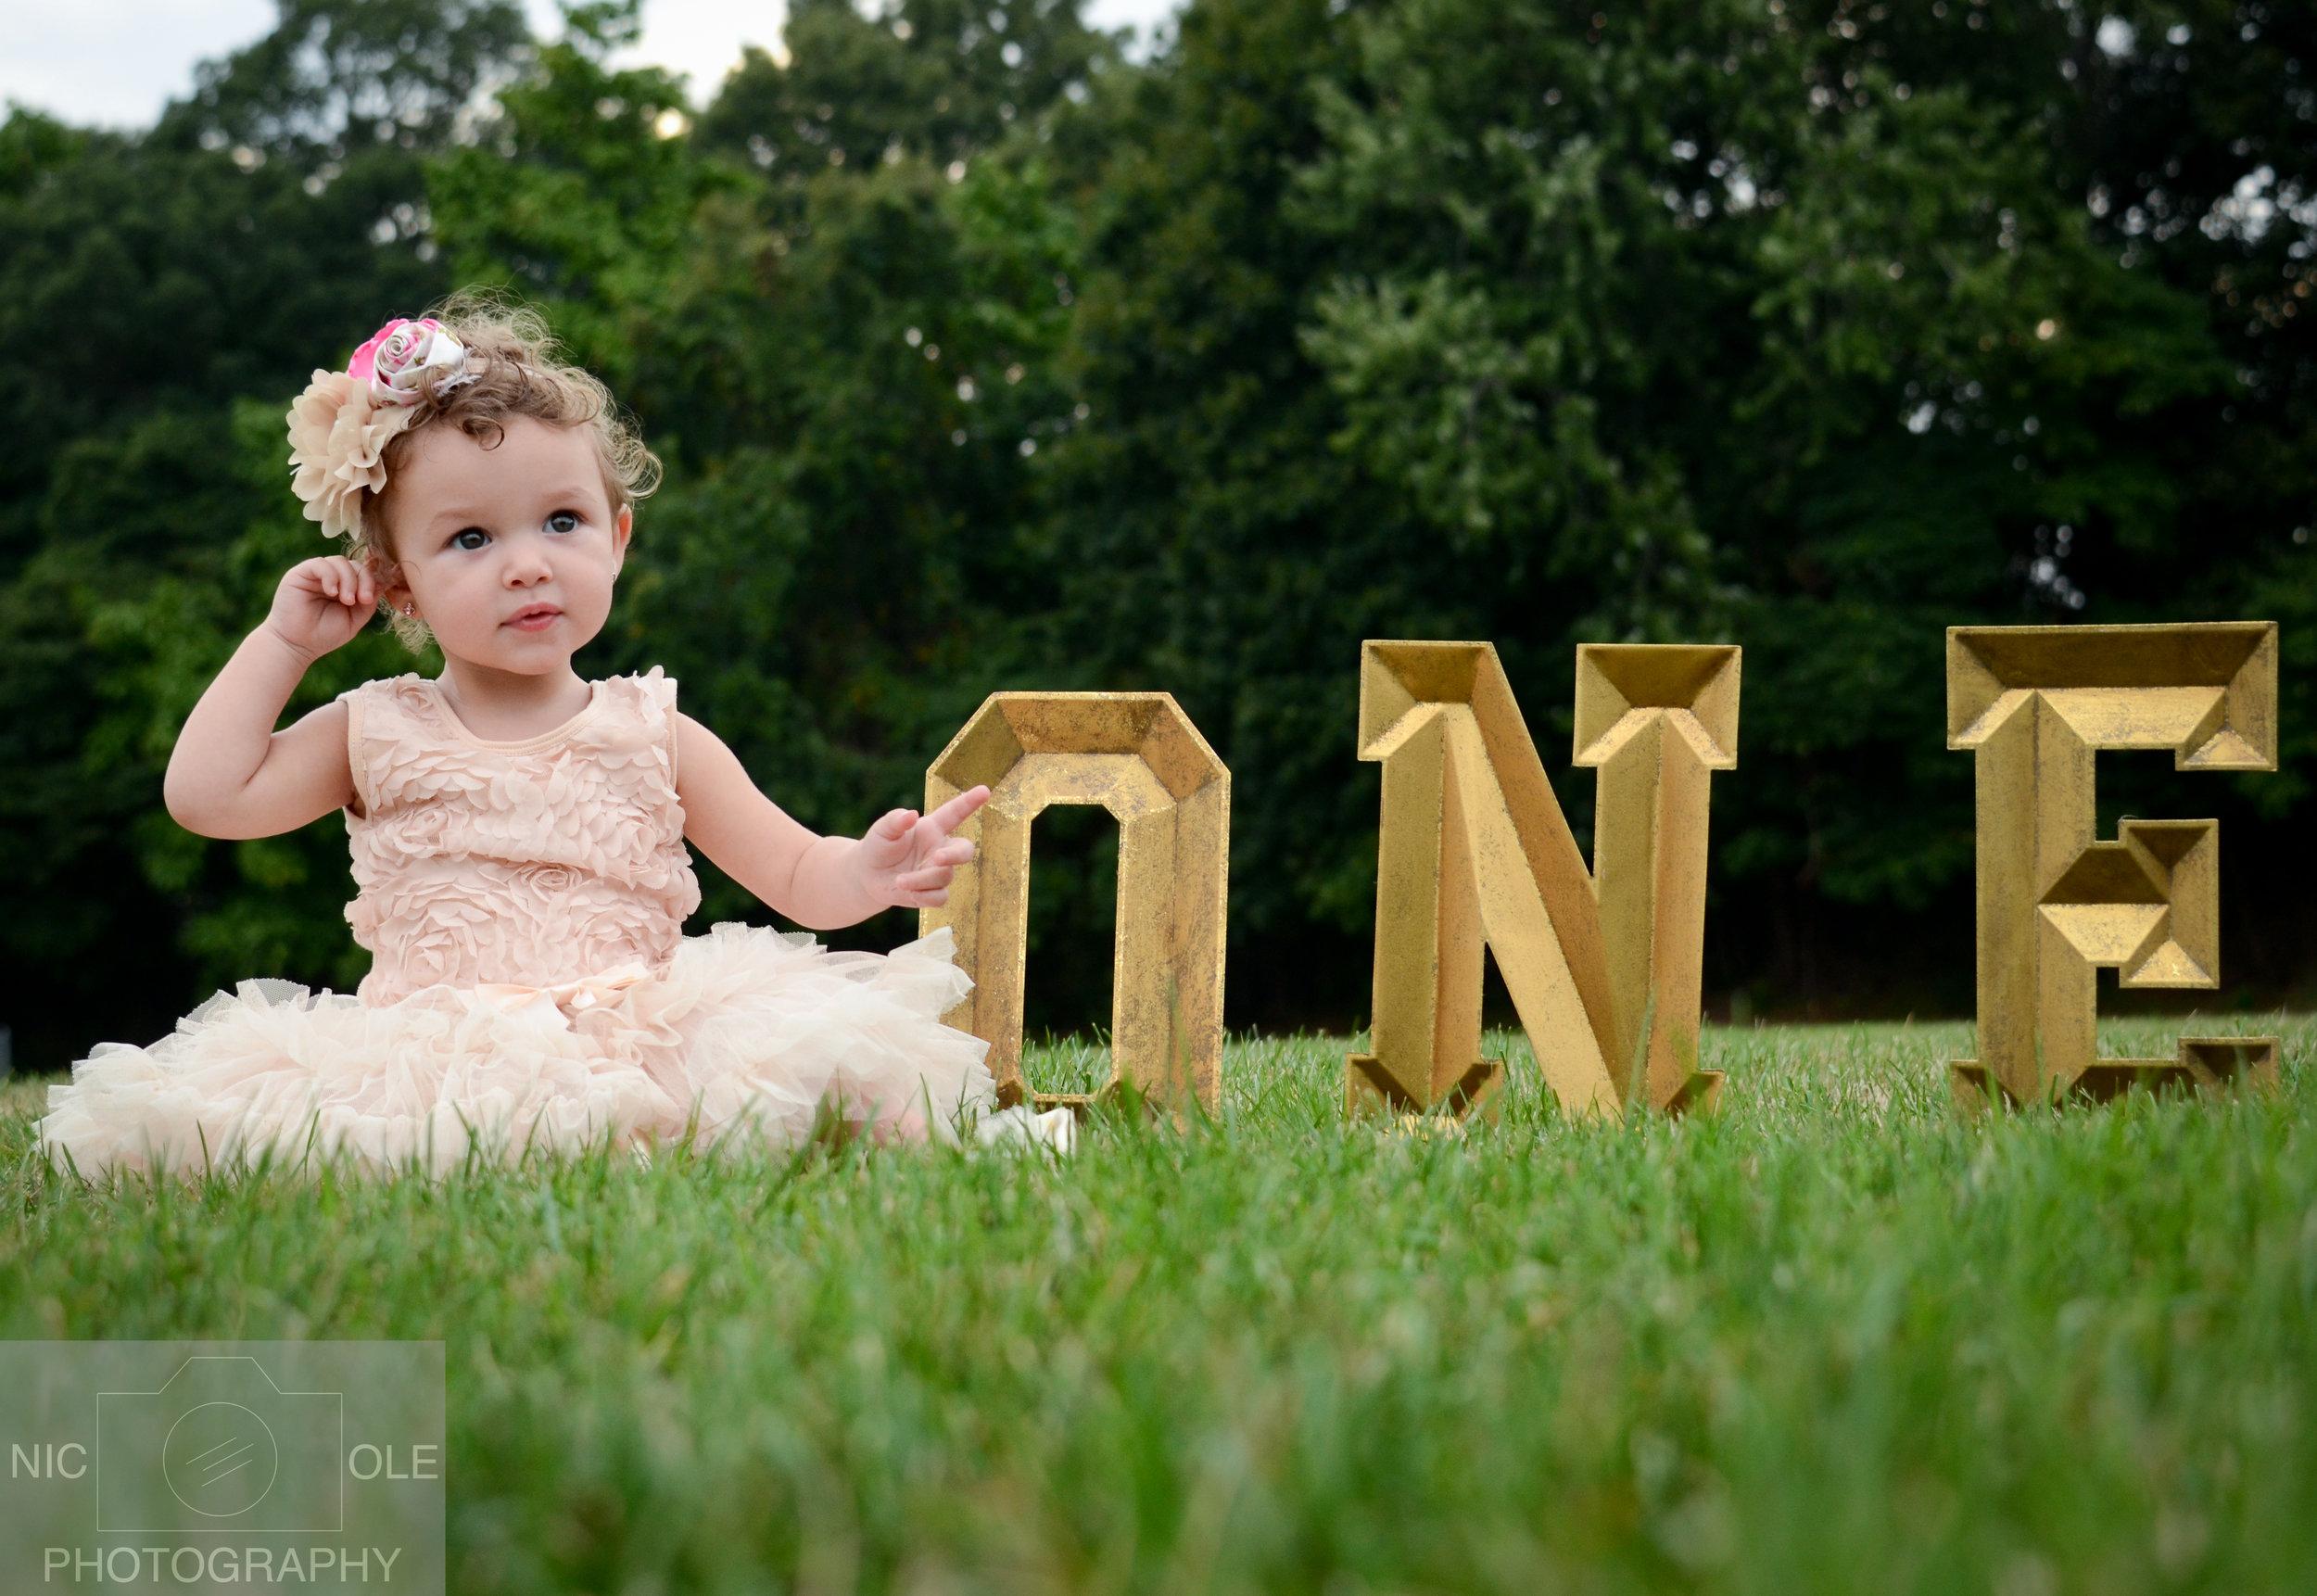 Ava Catherine-NIC-OLE Photography-5.jpg